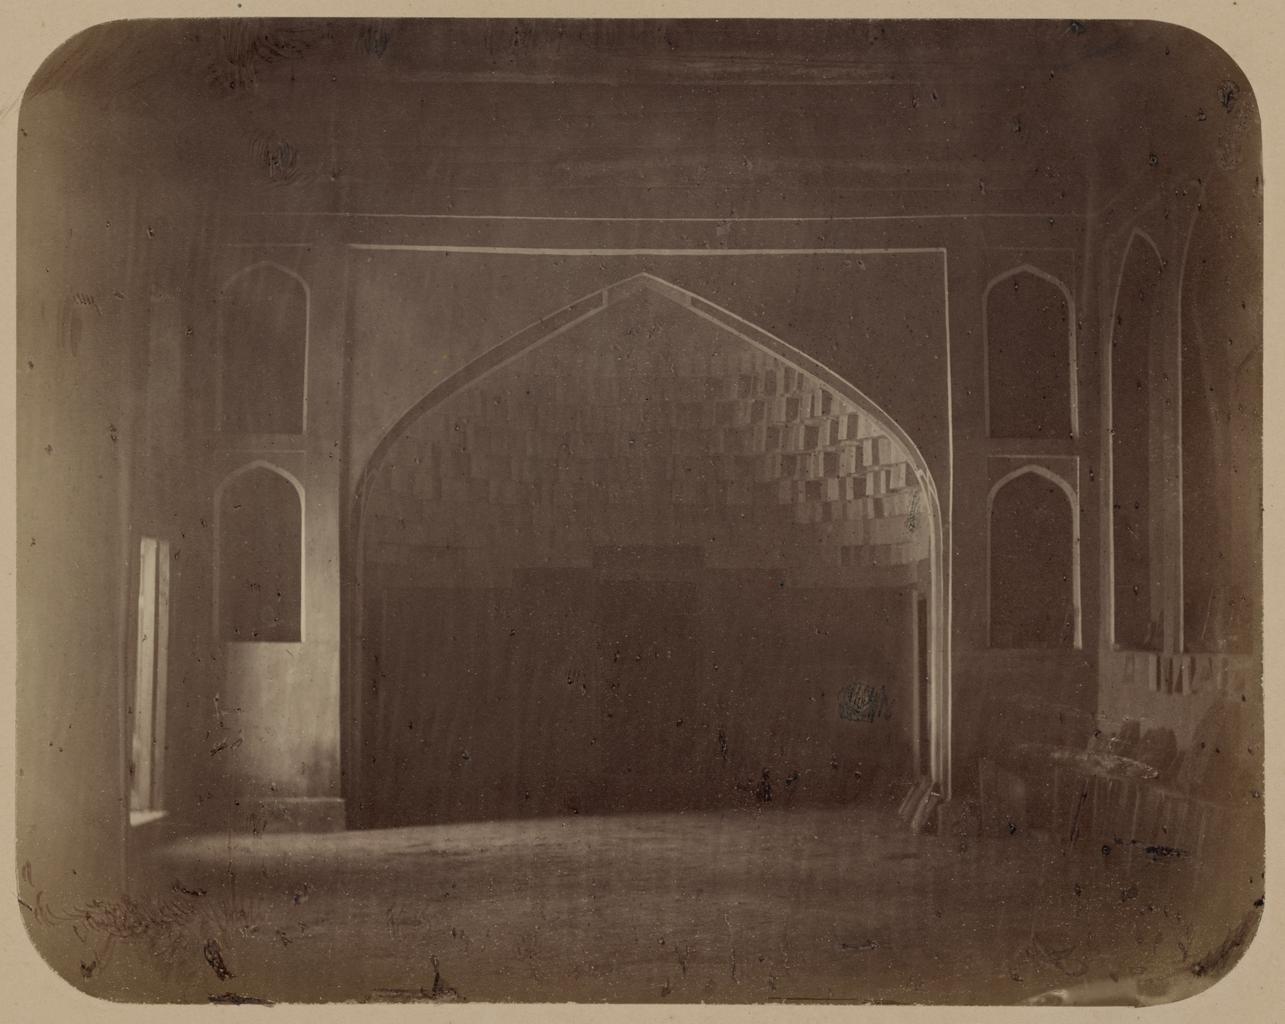 Дворец бухарских эмиров «Кок Таш». Арка в приемную залу